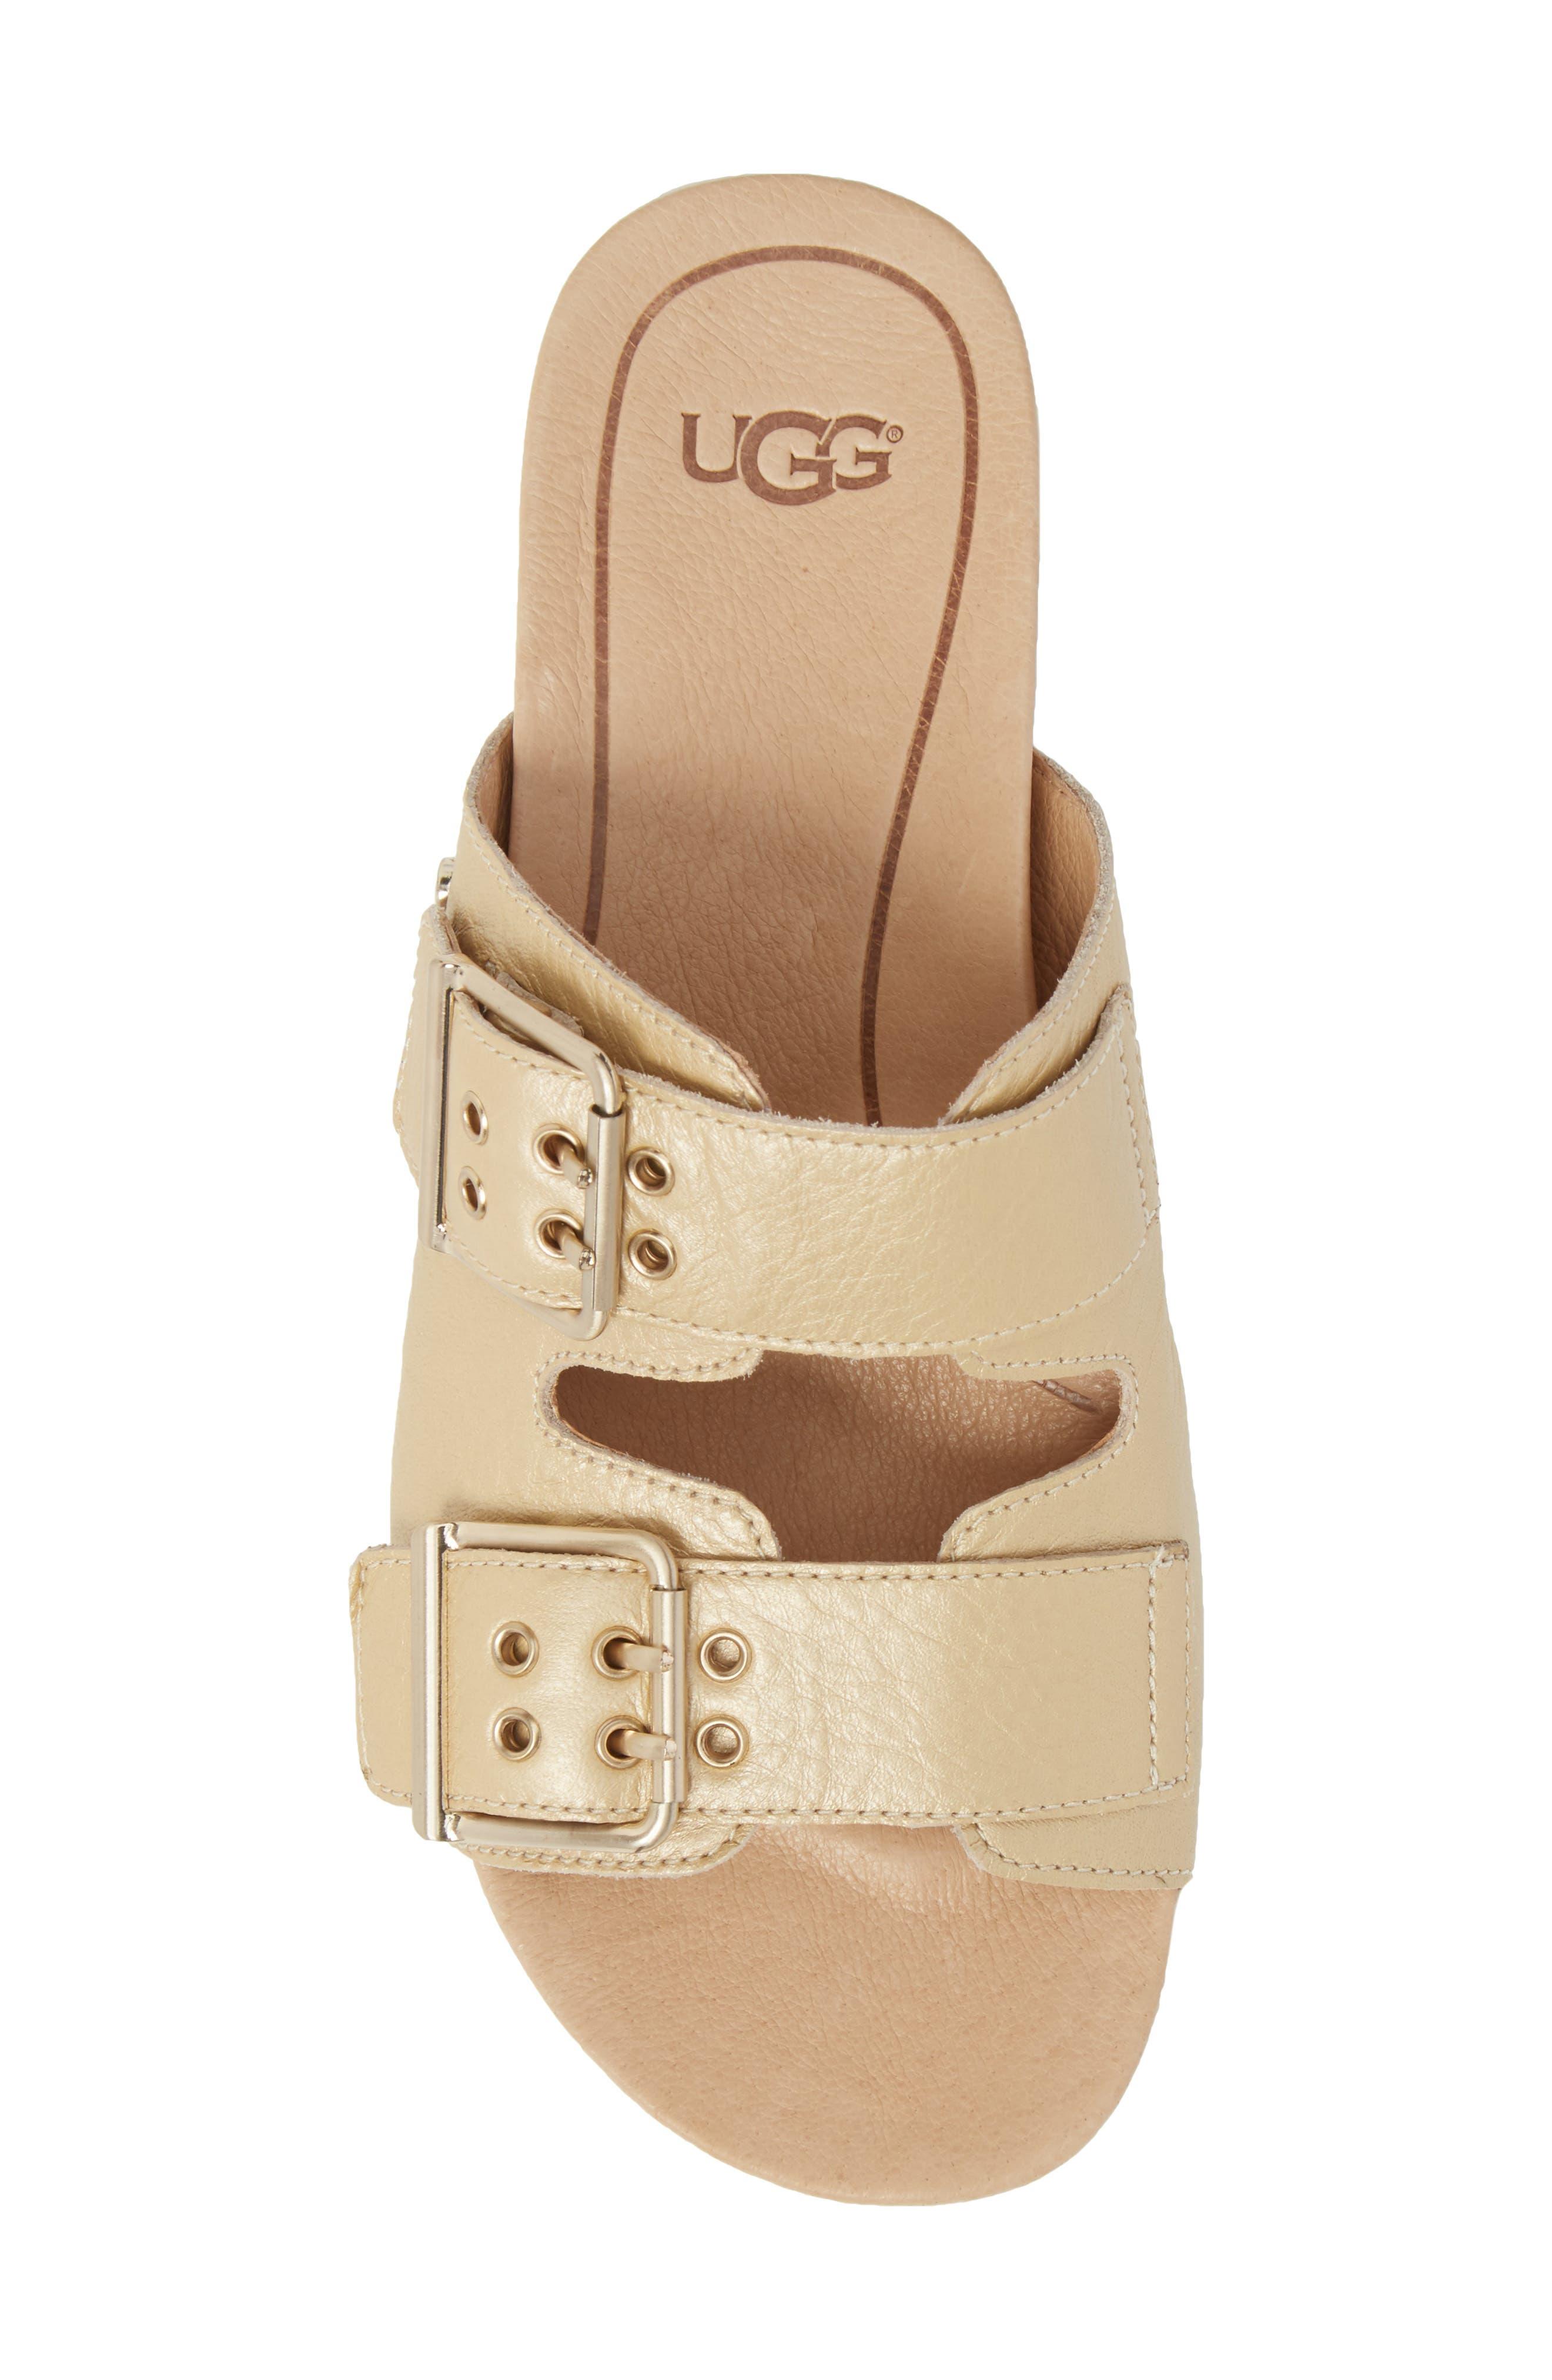 Cammie Platform Sandal,                             Alternate thumbnail 5, color,                             Gold Patent Leather